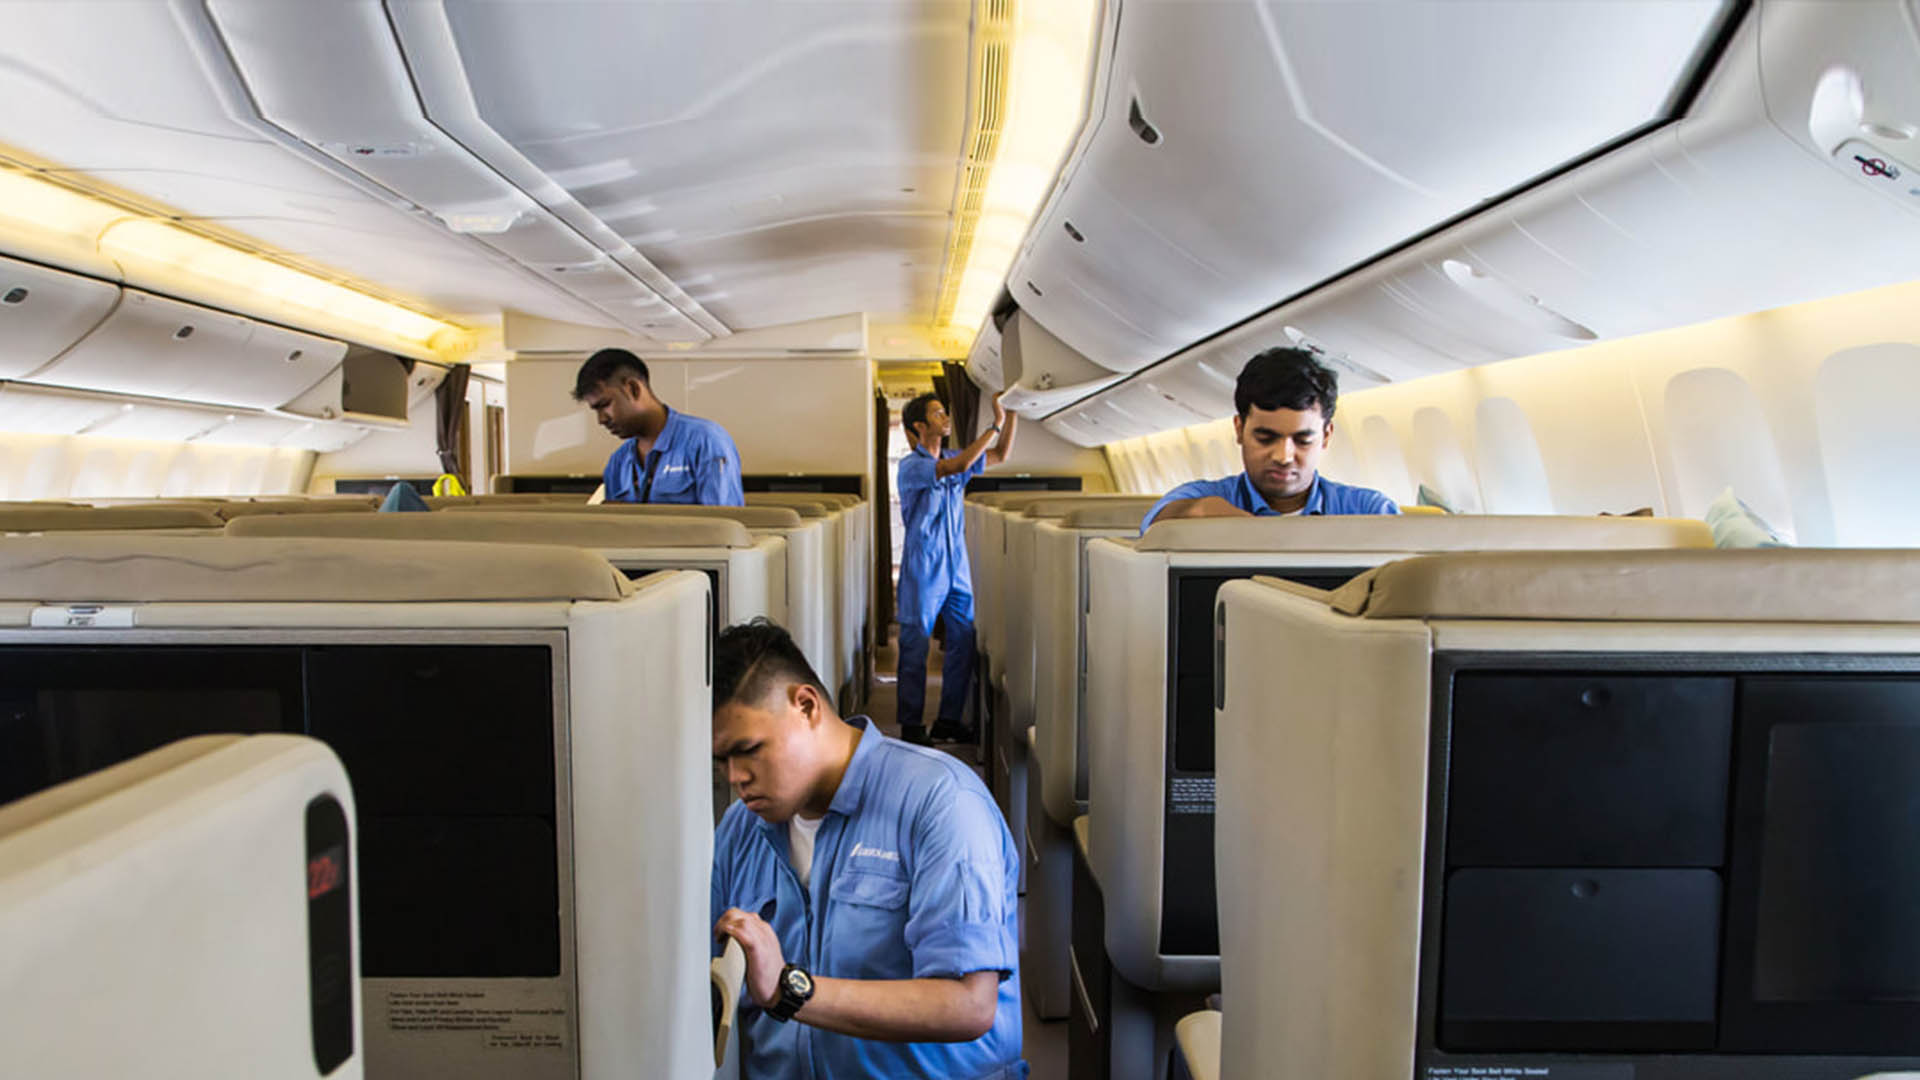 wsdip aircraft cabin engineering